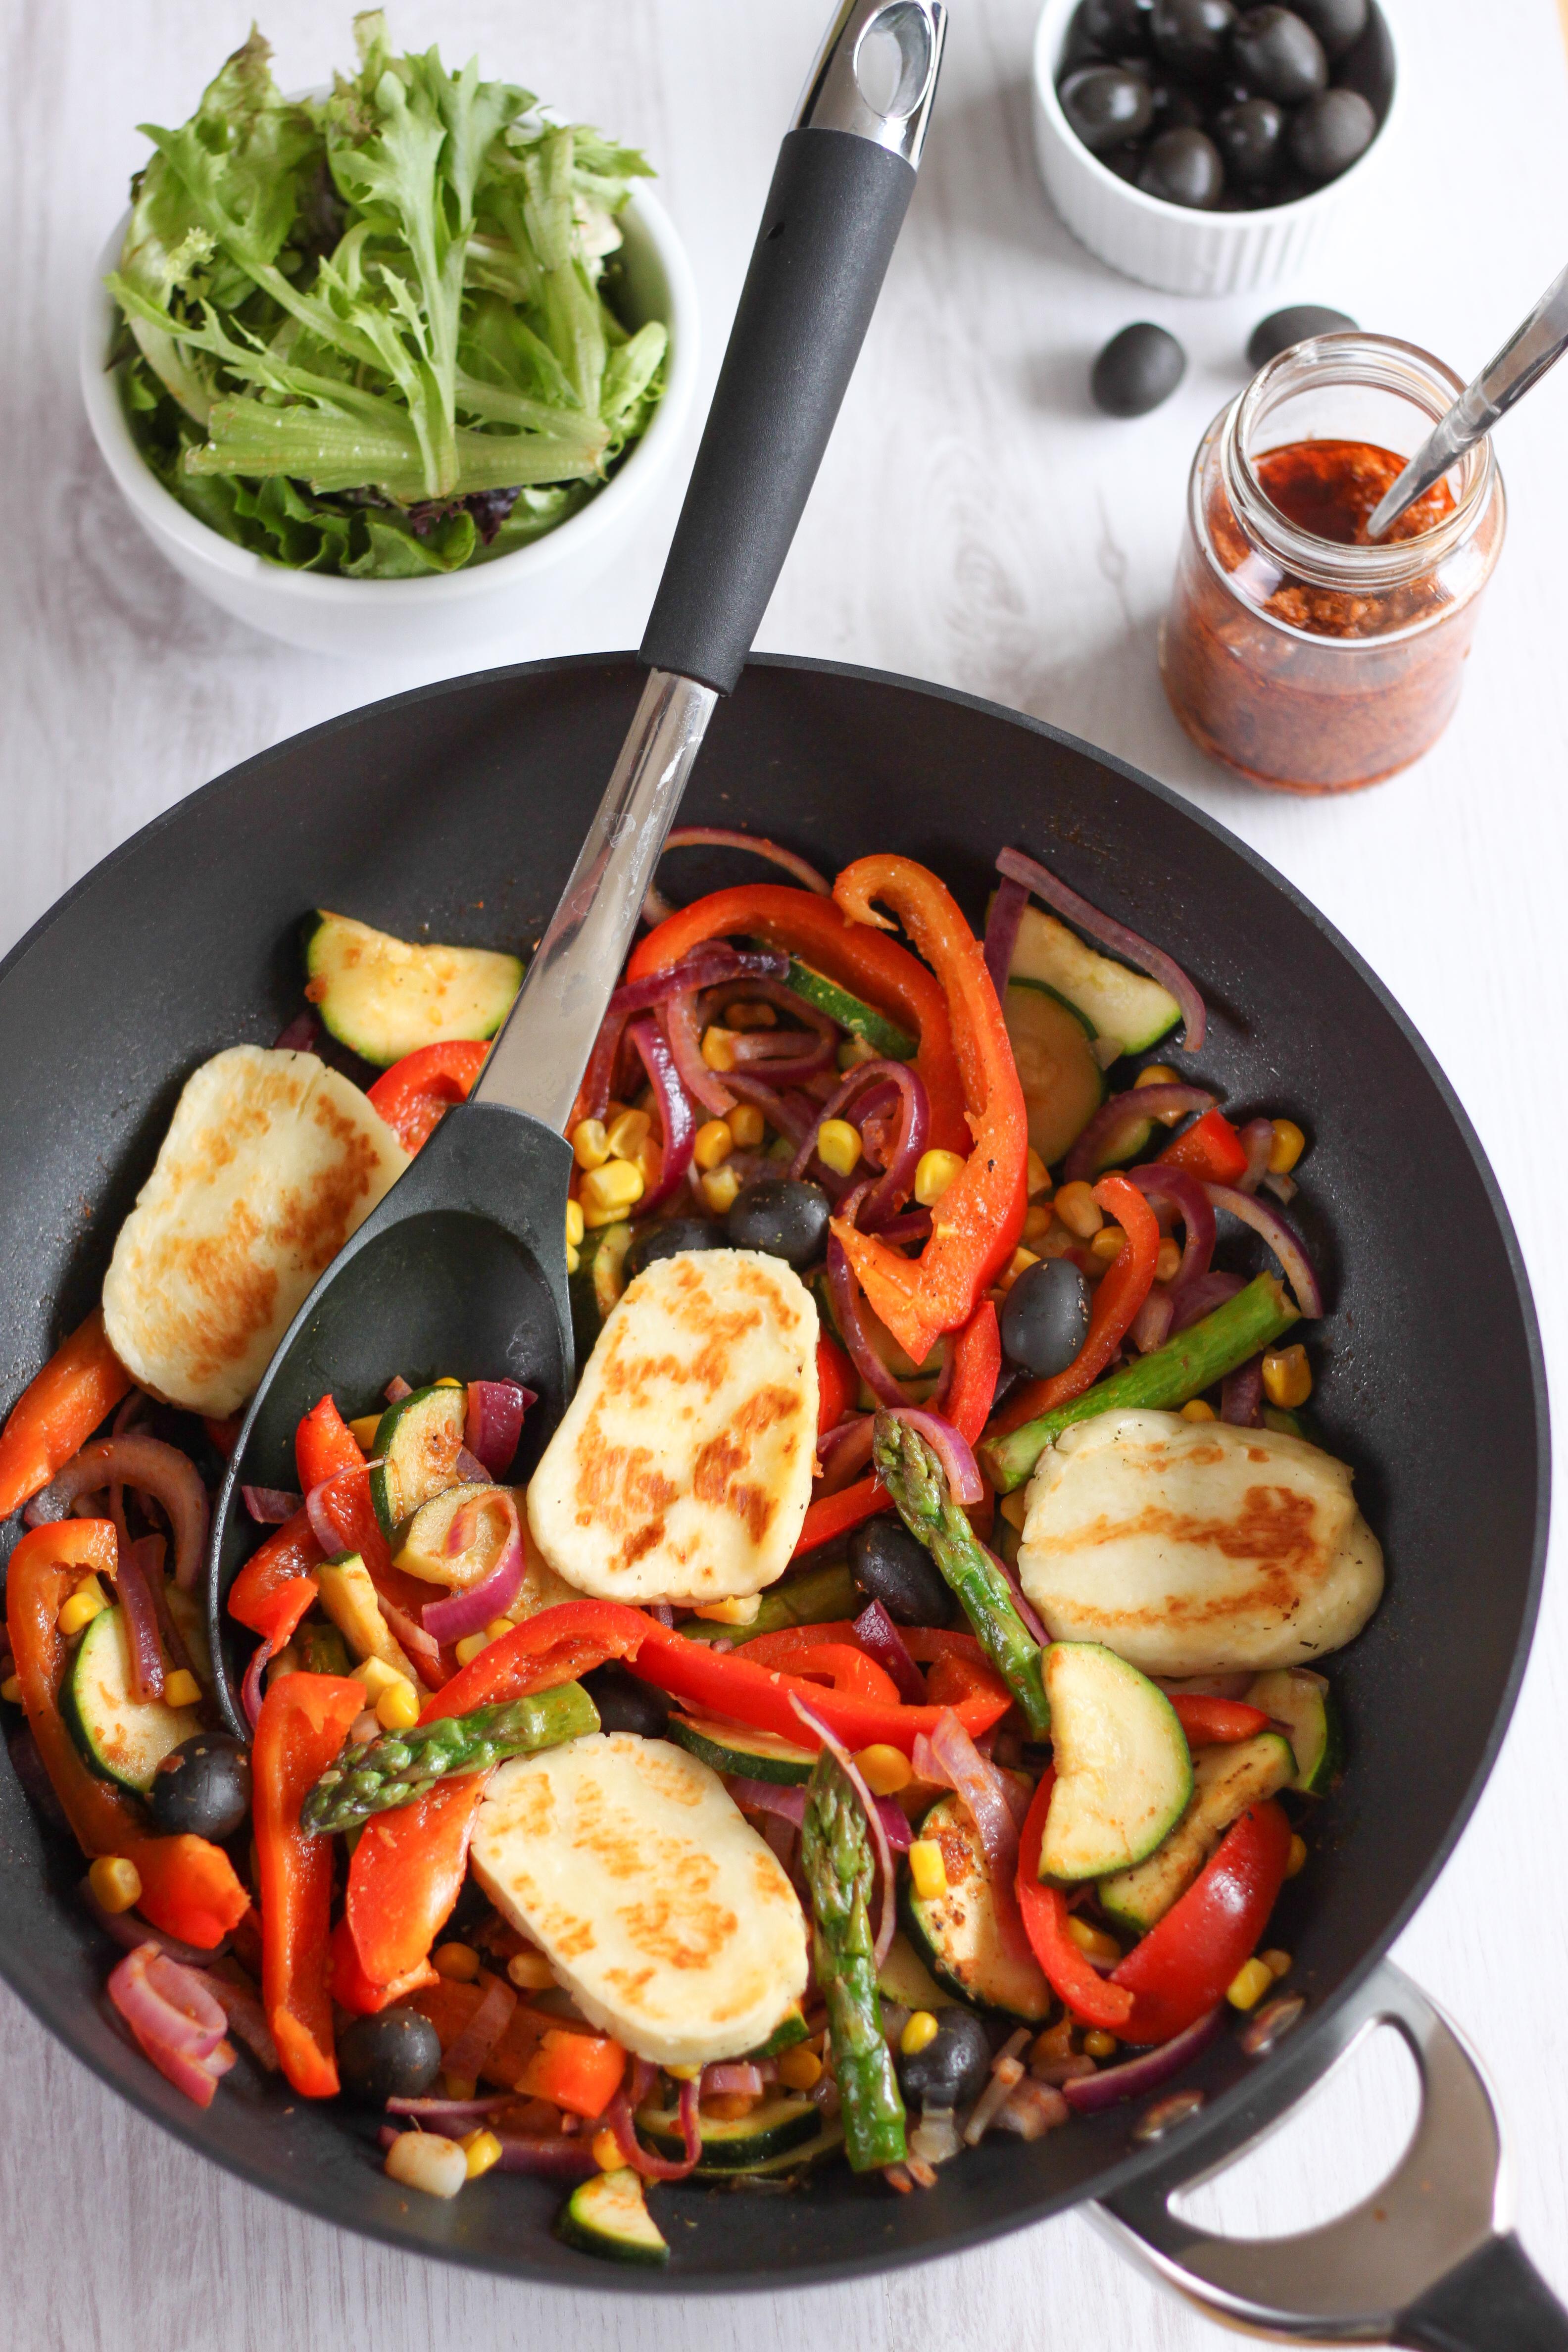 Mediterranean Stir Fry with Halloumi